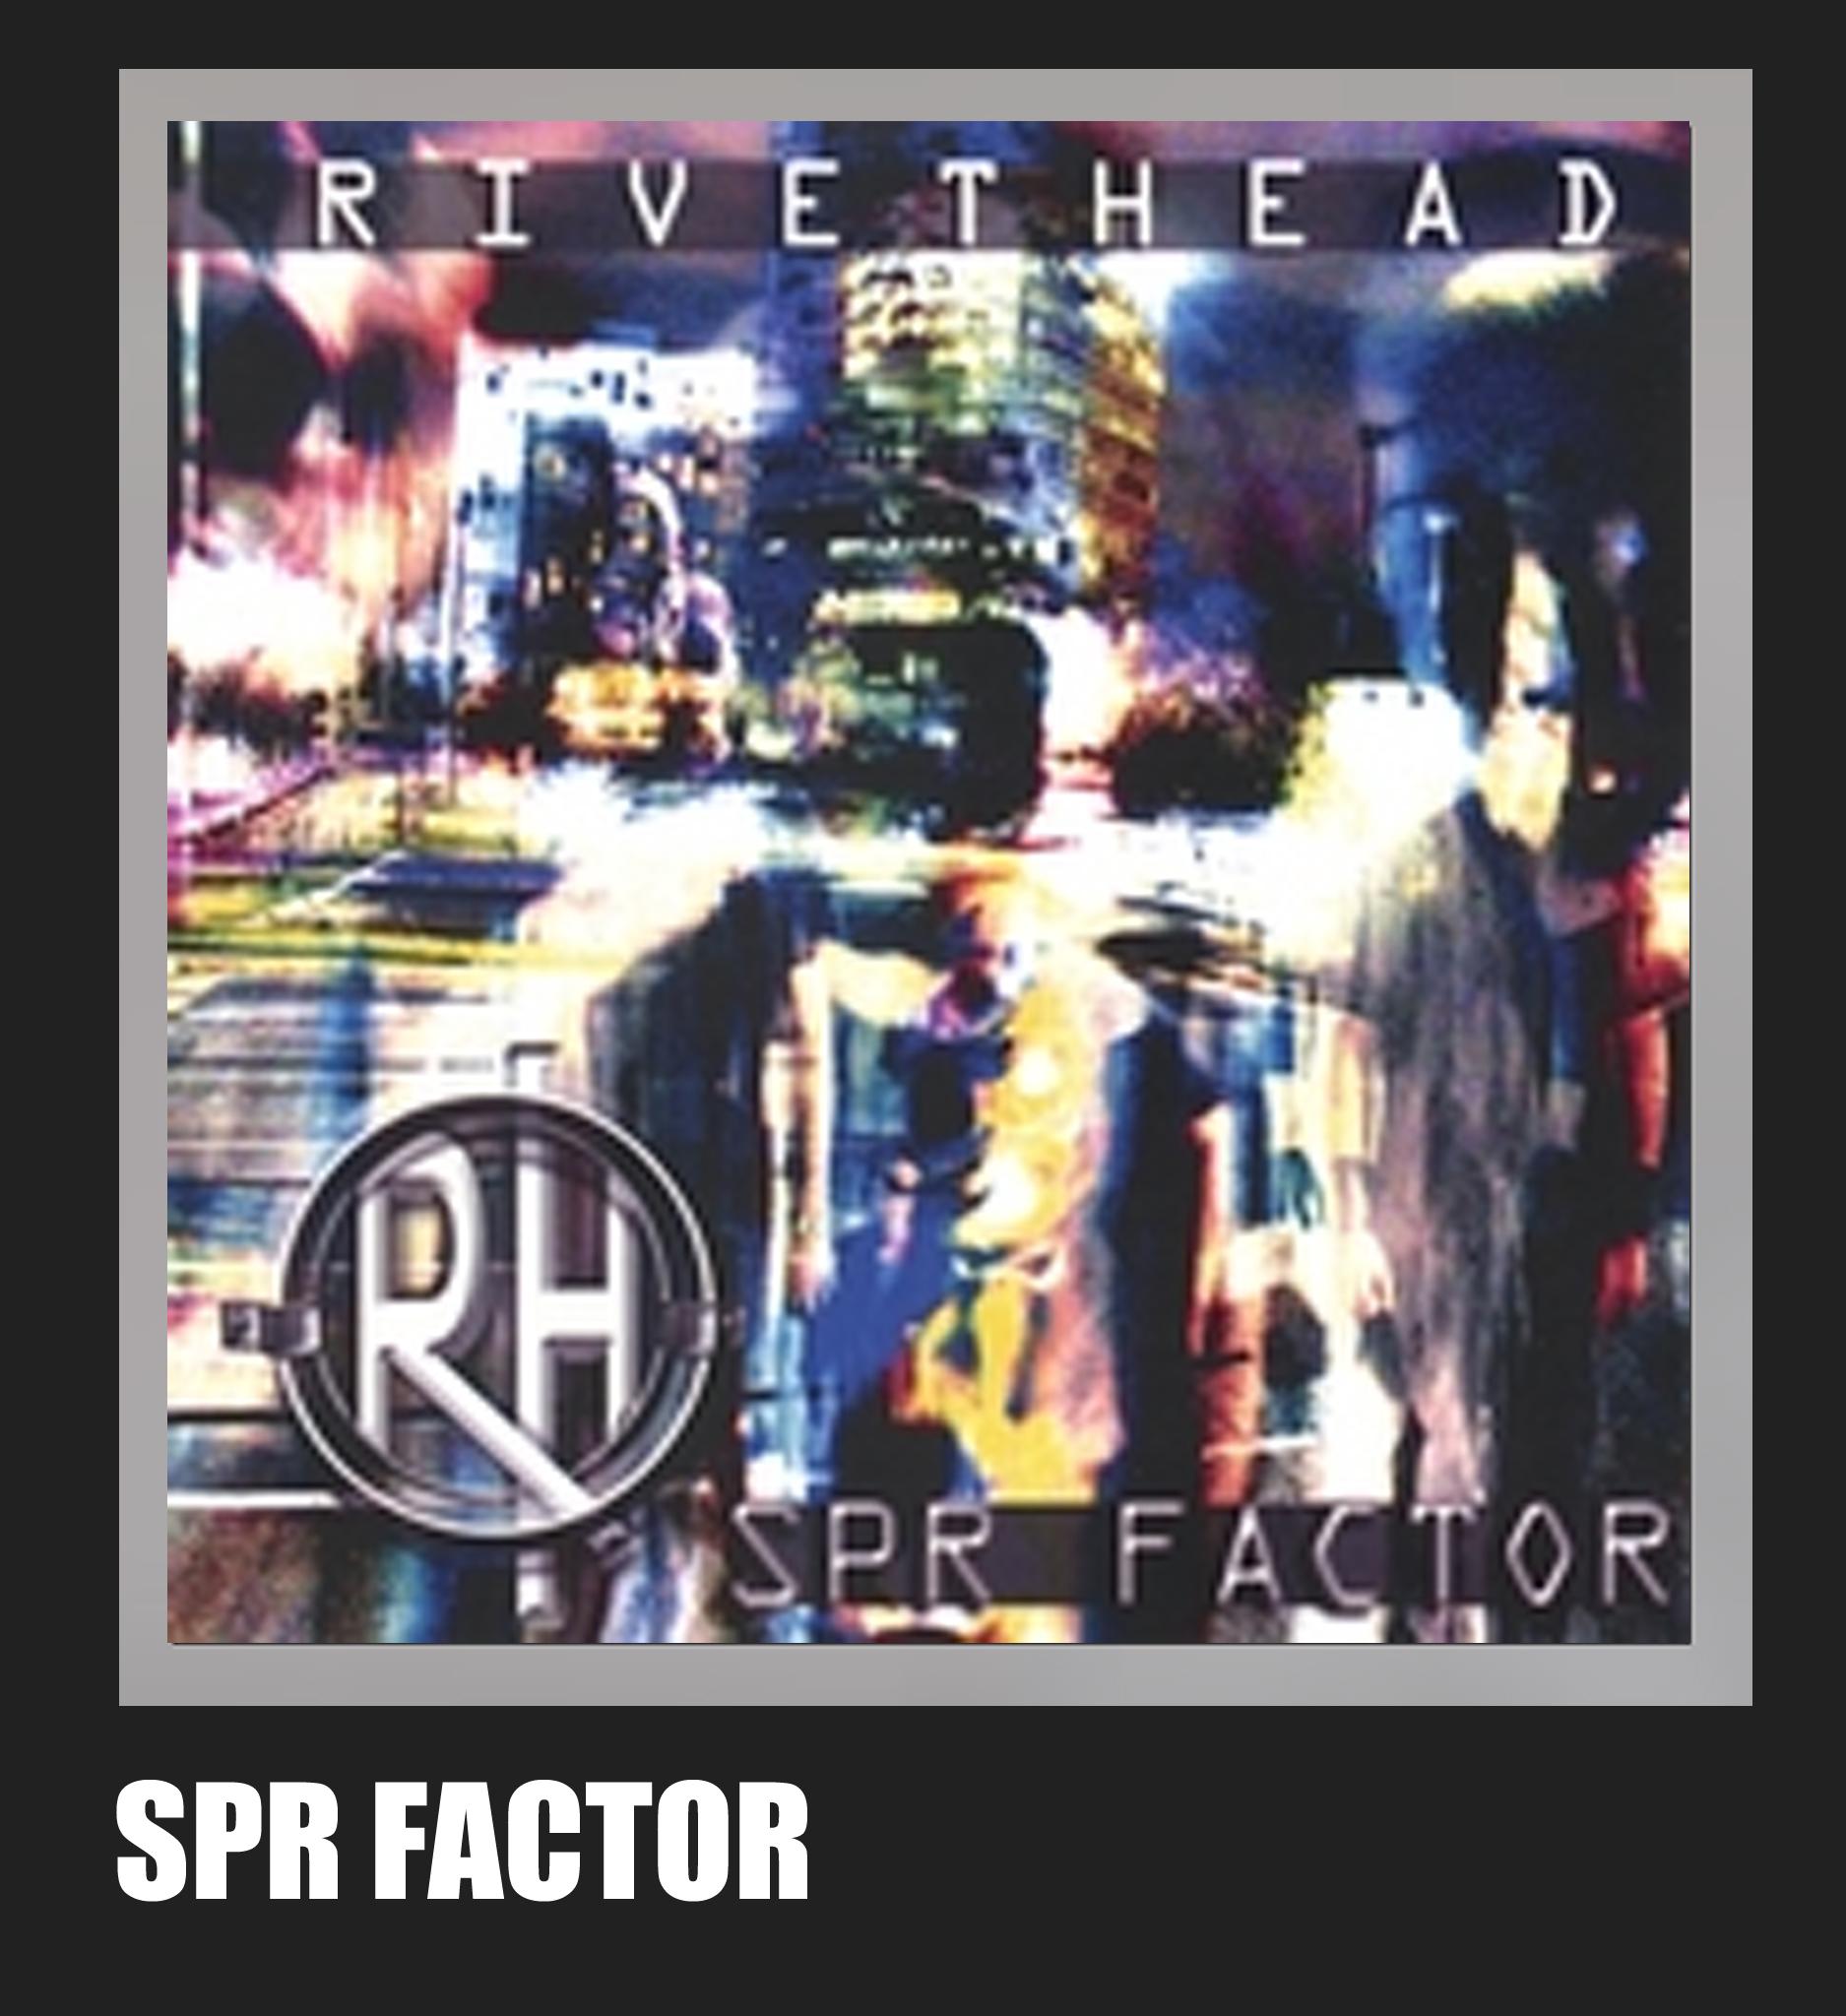 SPR Factor release